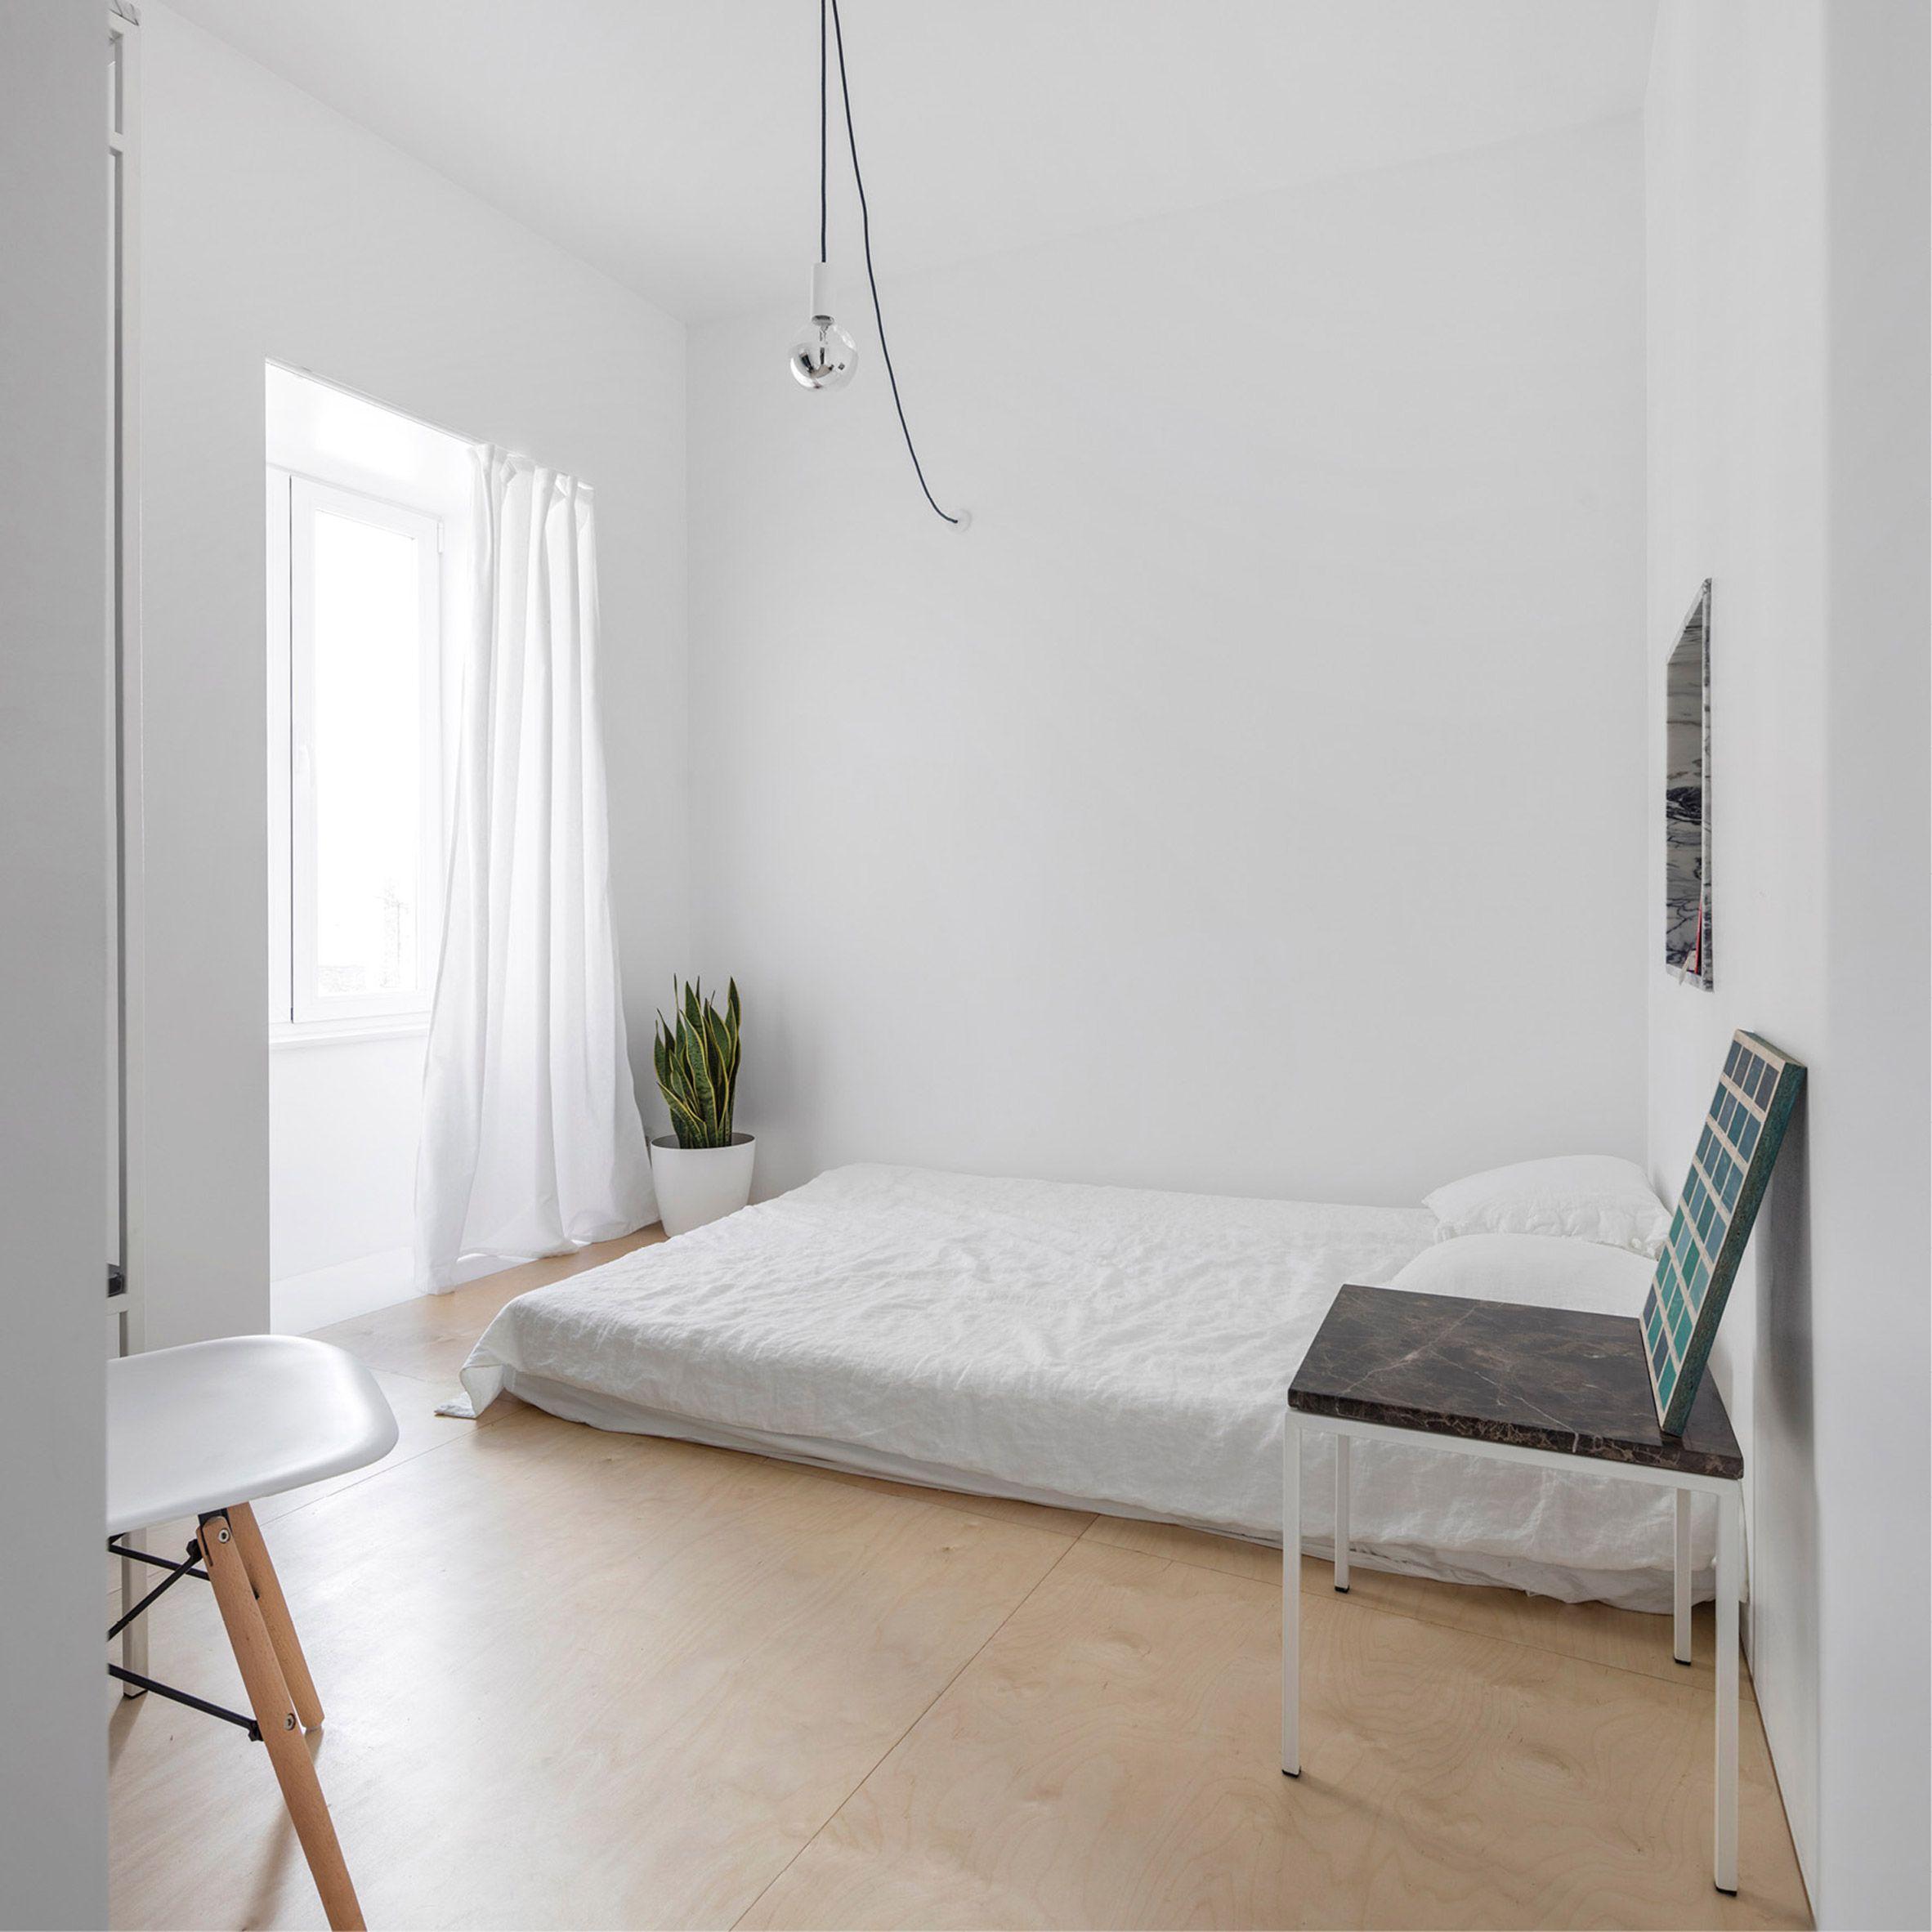 Porto Studio Fala Atelier Has Overhauled The Layout Of A